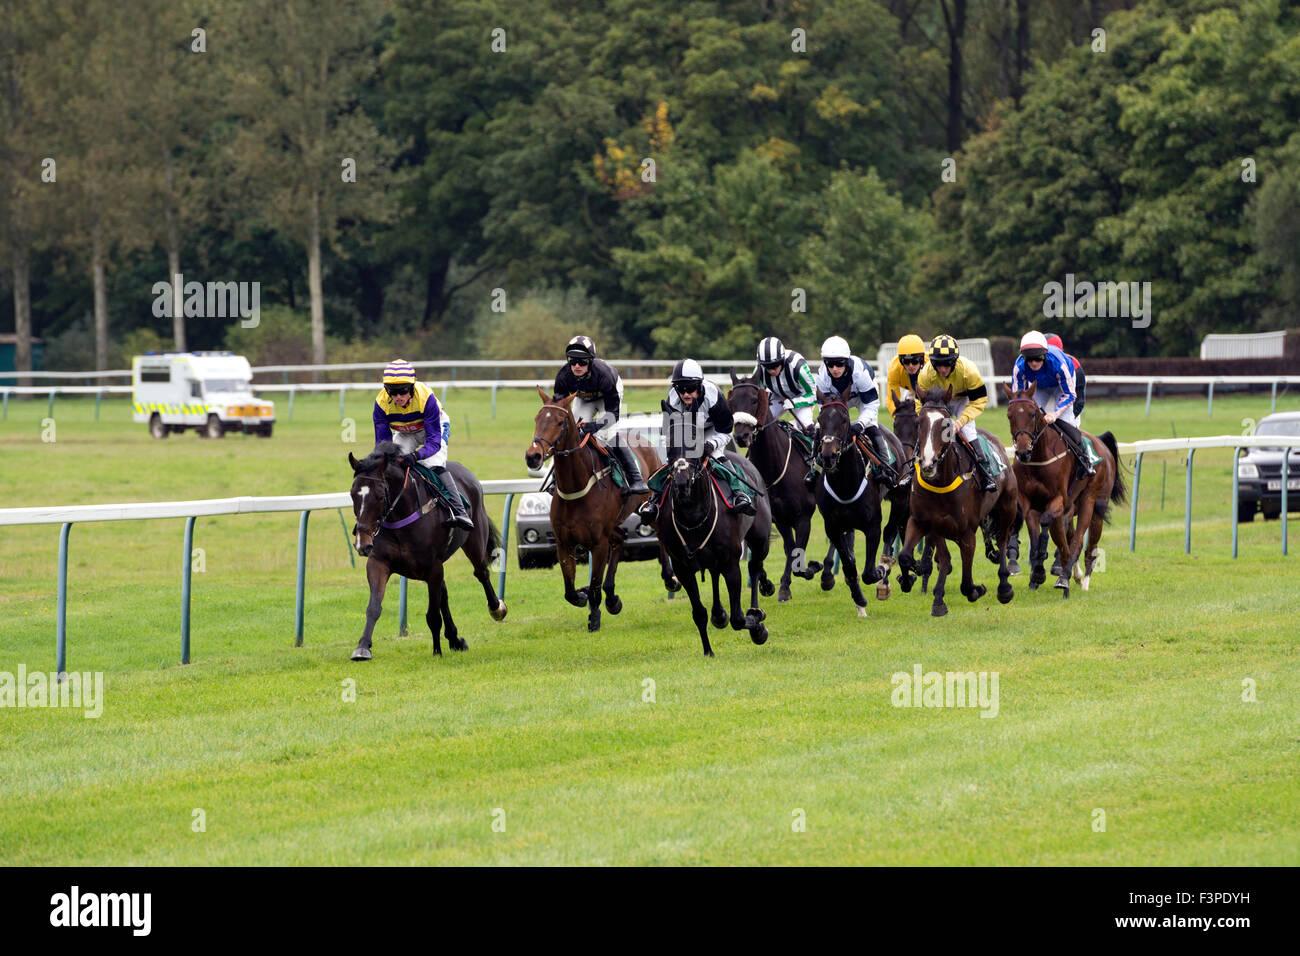 Horses racing at Towcester Races, Northamptonshire, England, UK - Stock Image